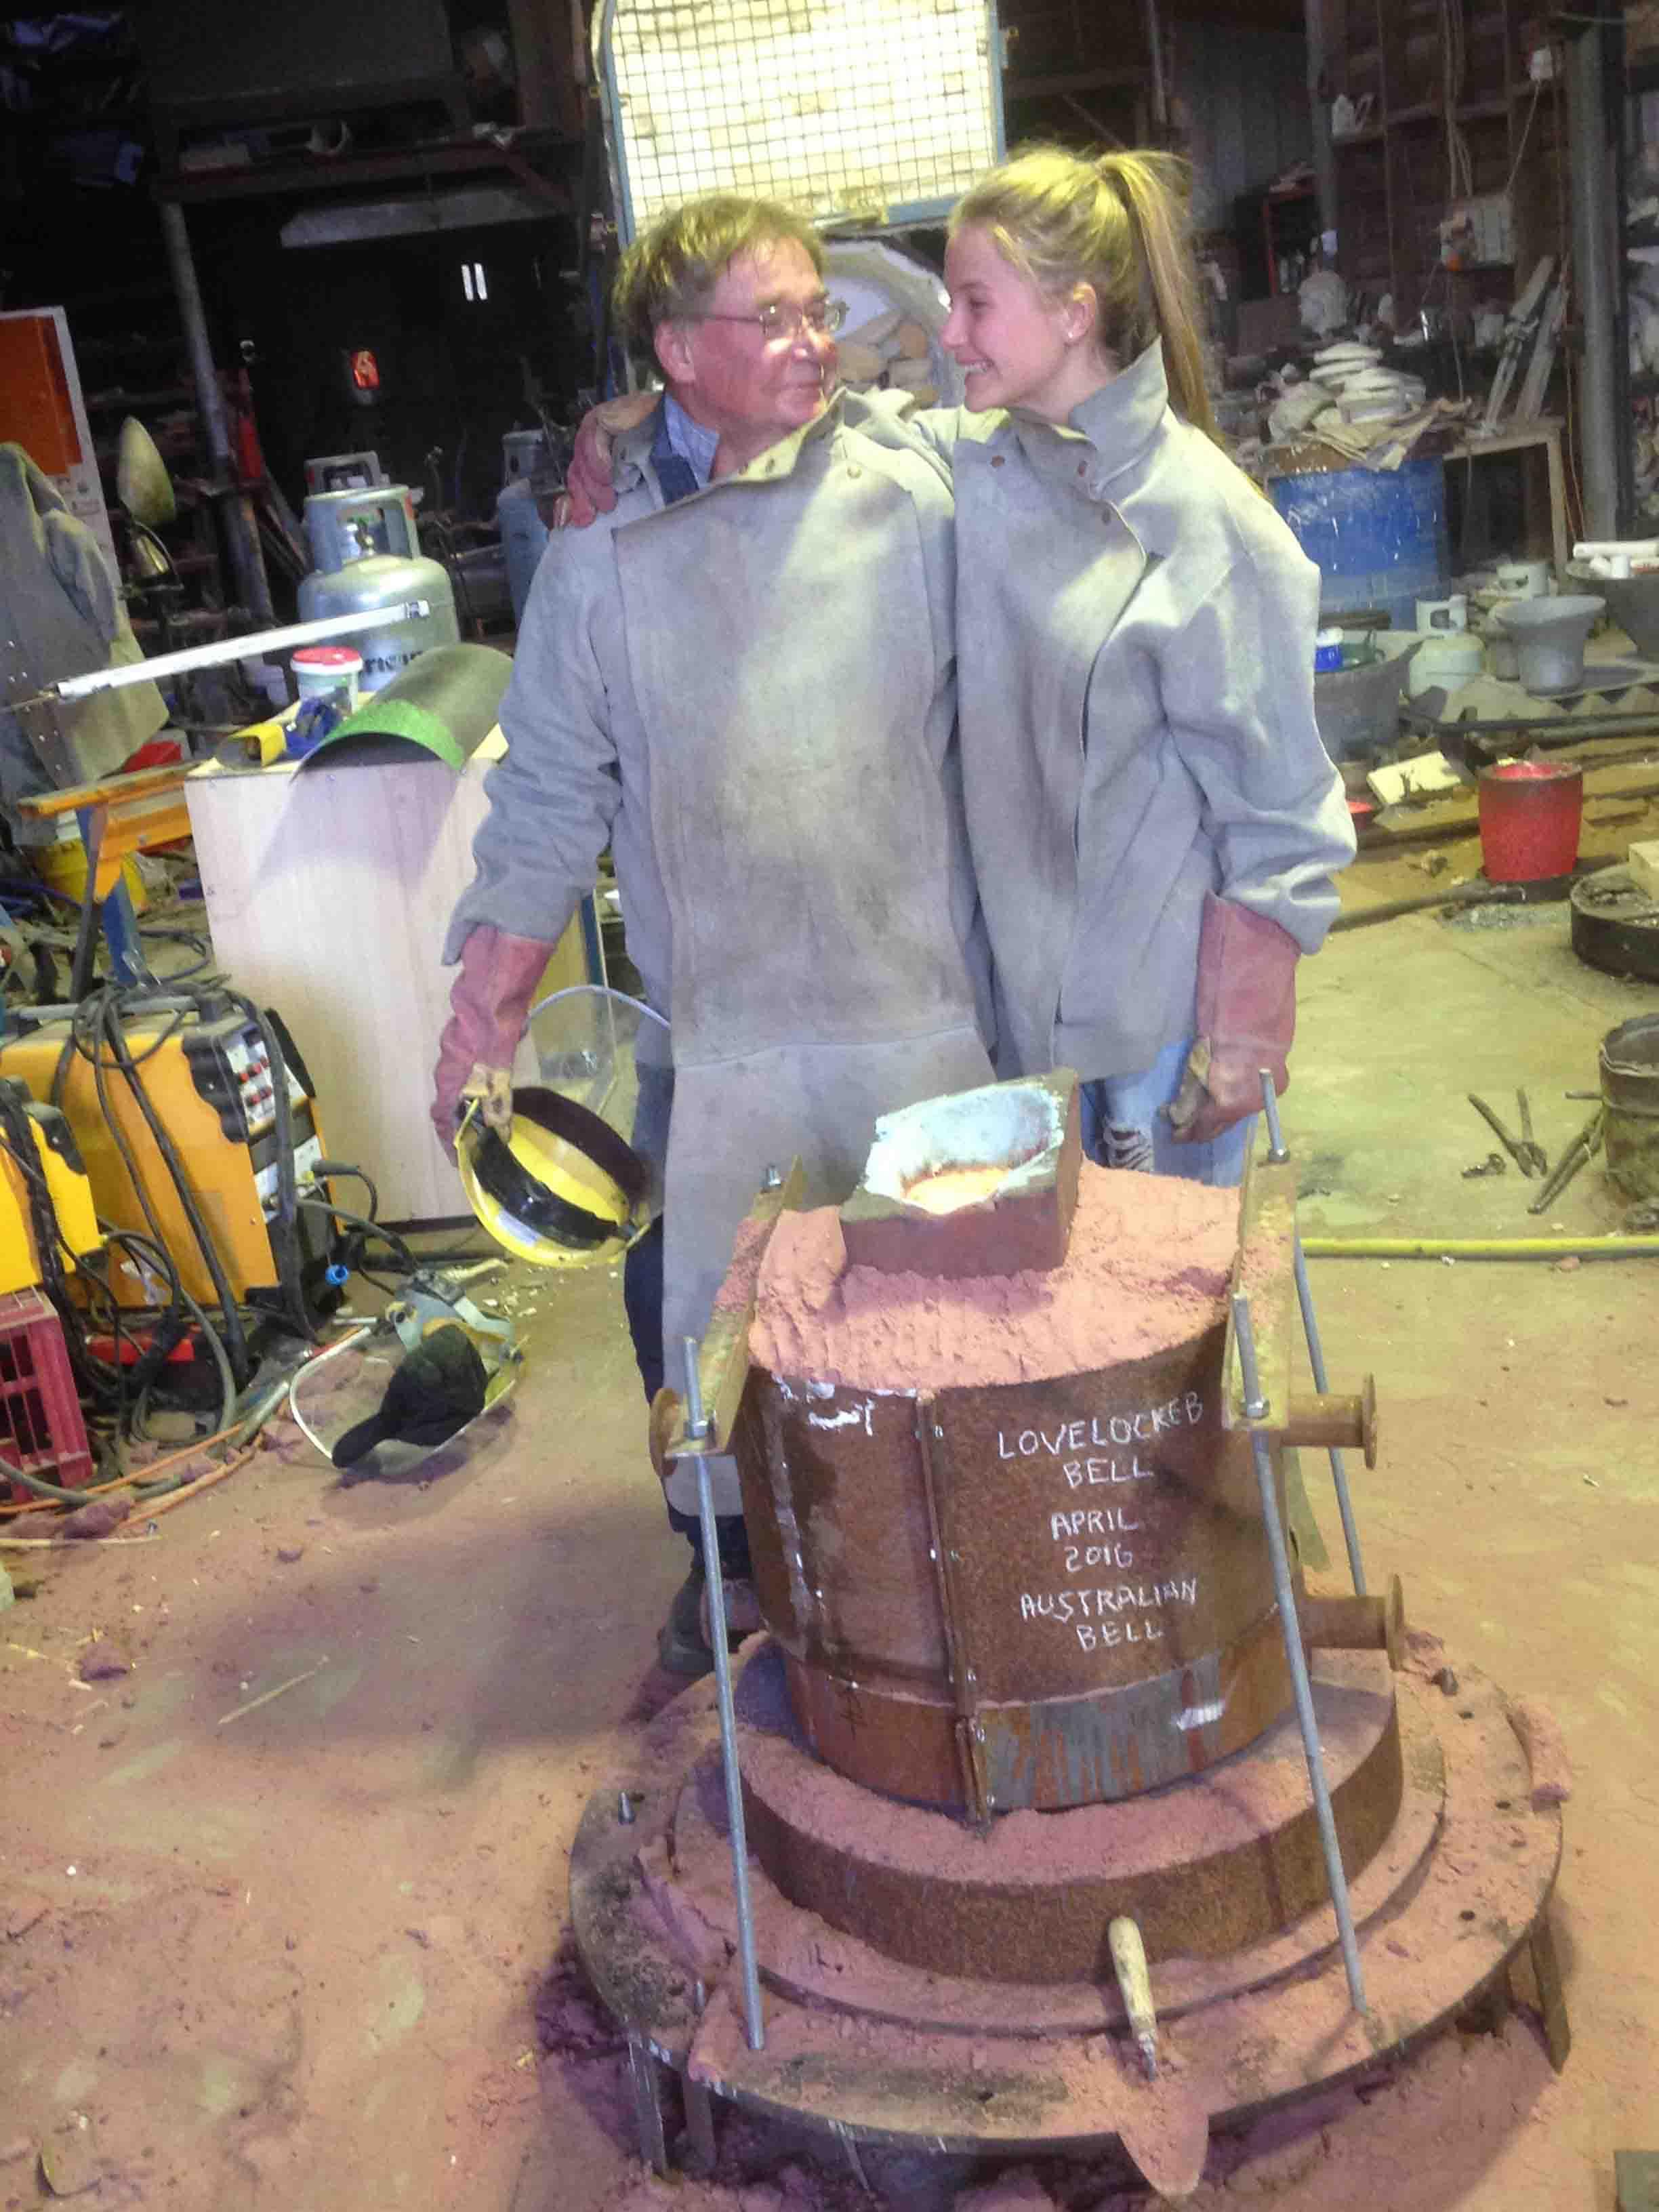 Anton and matilda casting the Lovelocked bell 2015